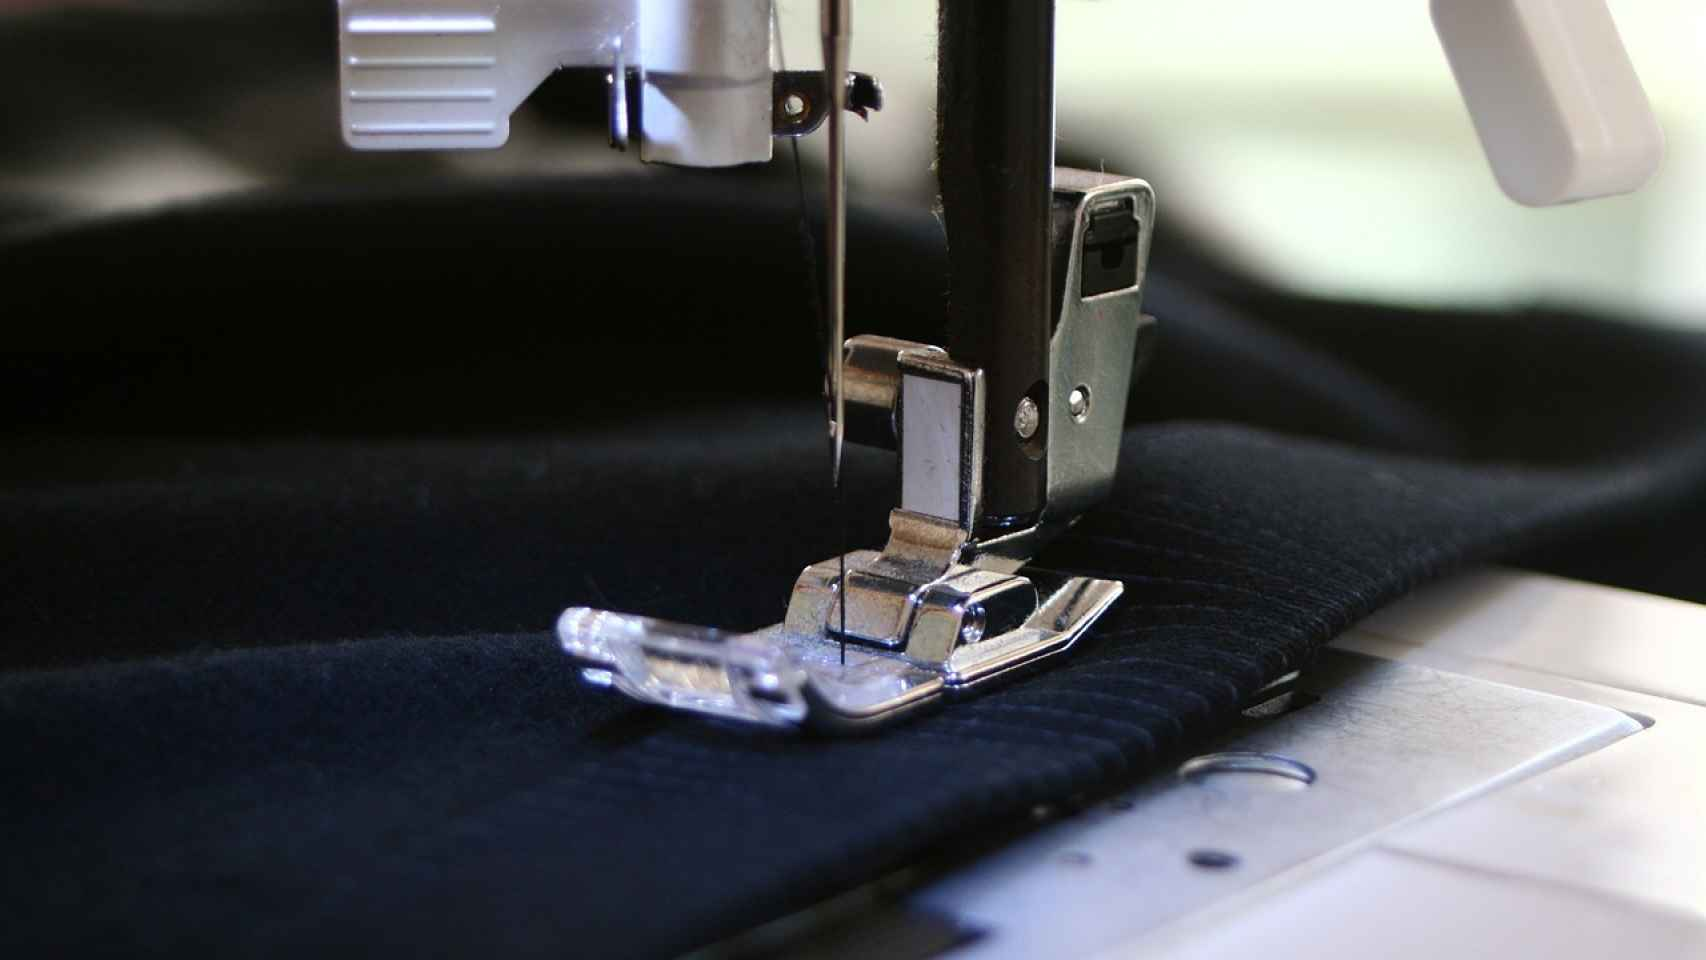 Cómo Coser A Máquina Costura Para Principiantes